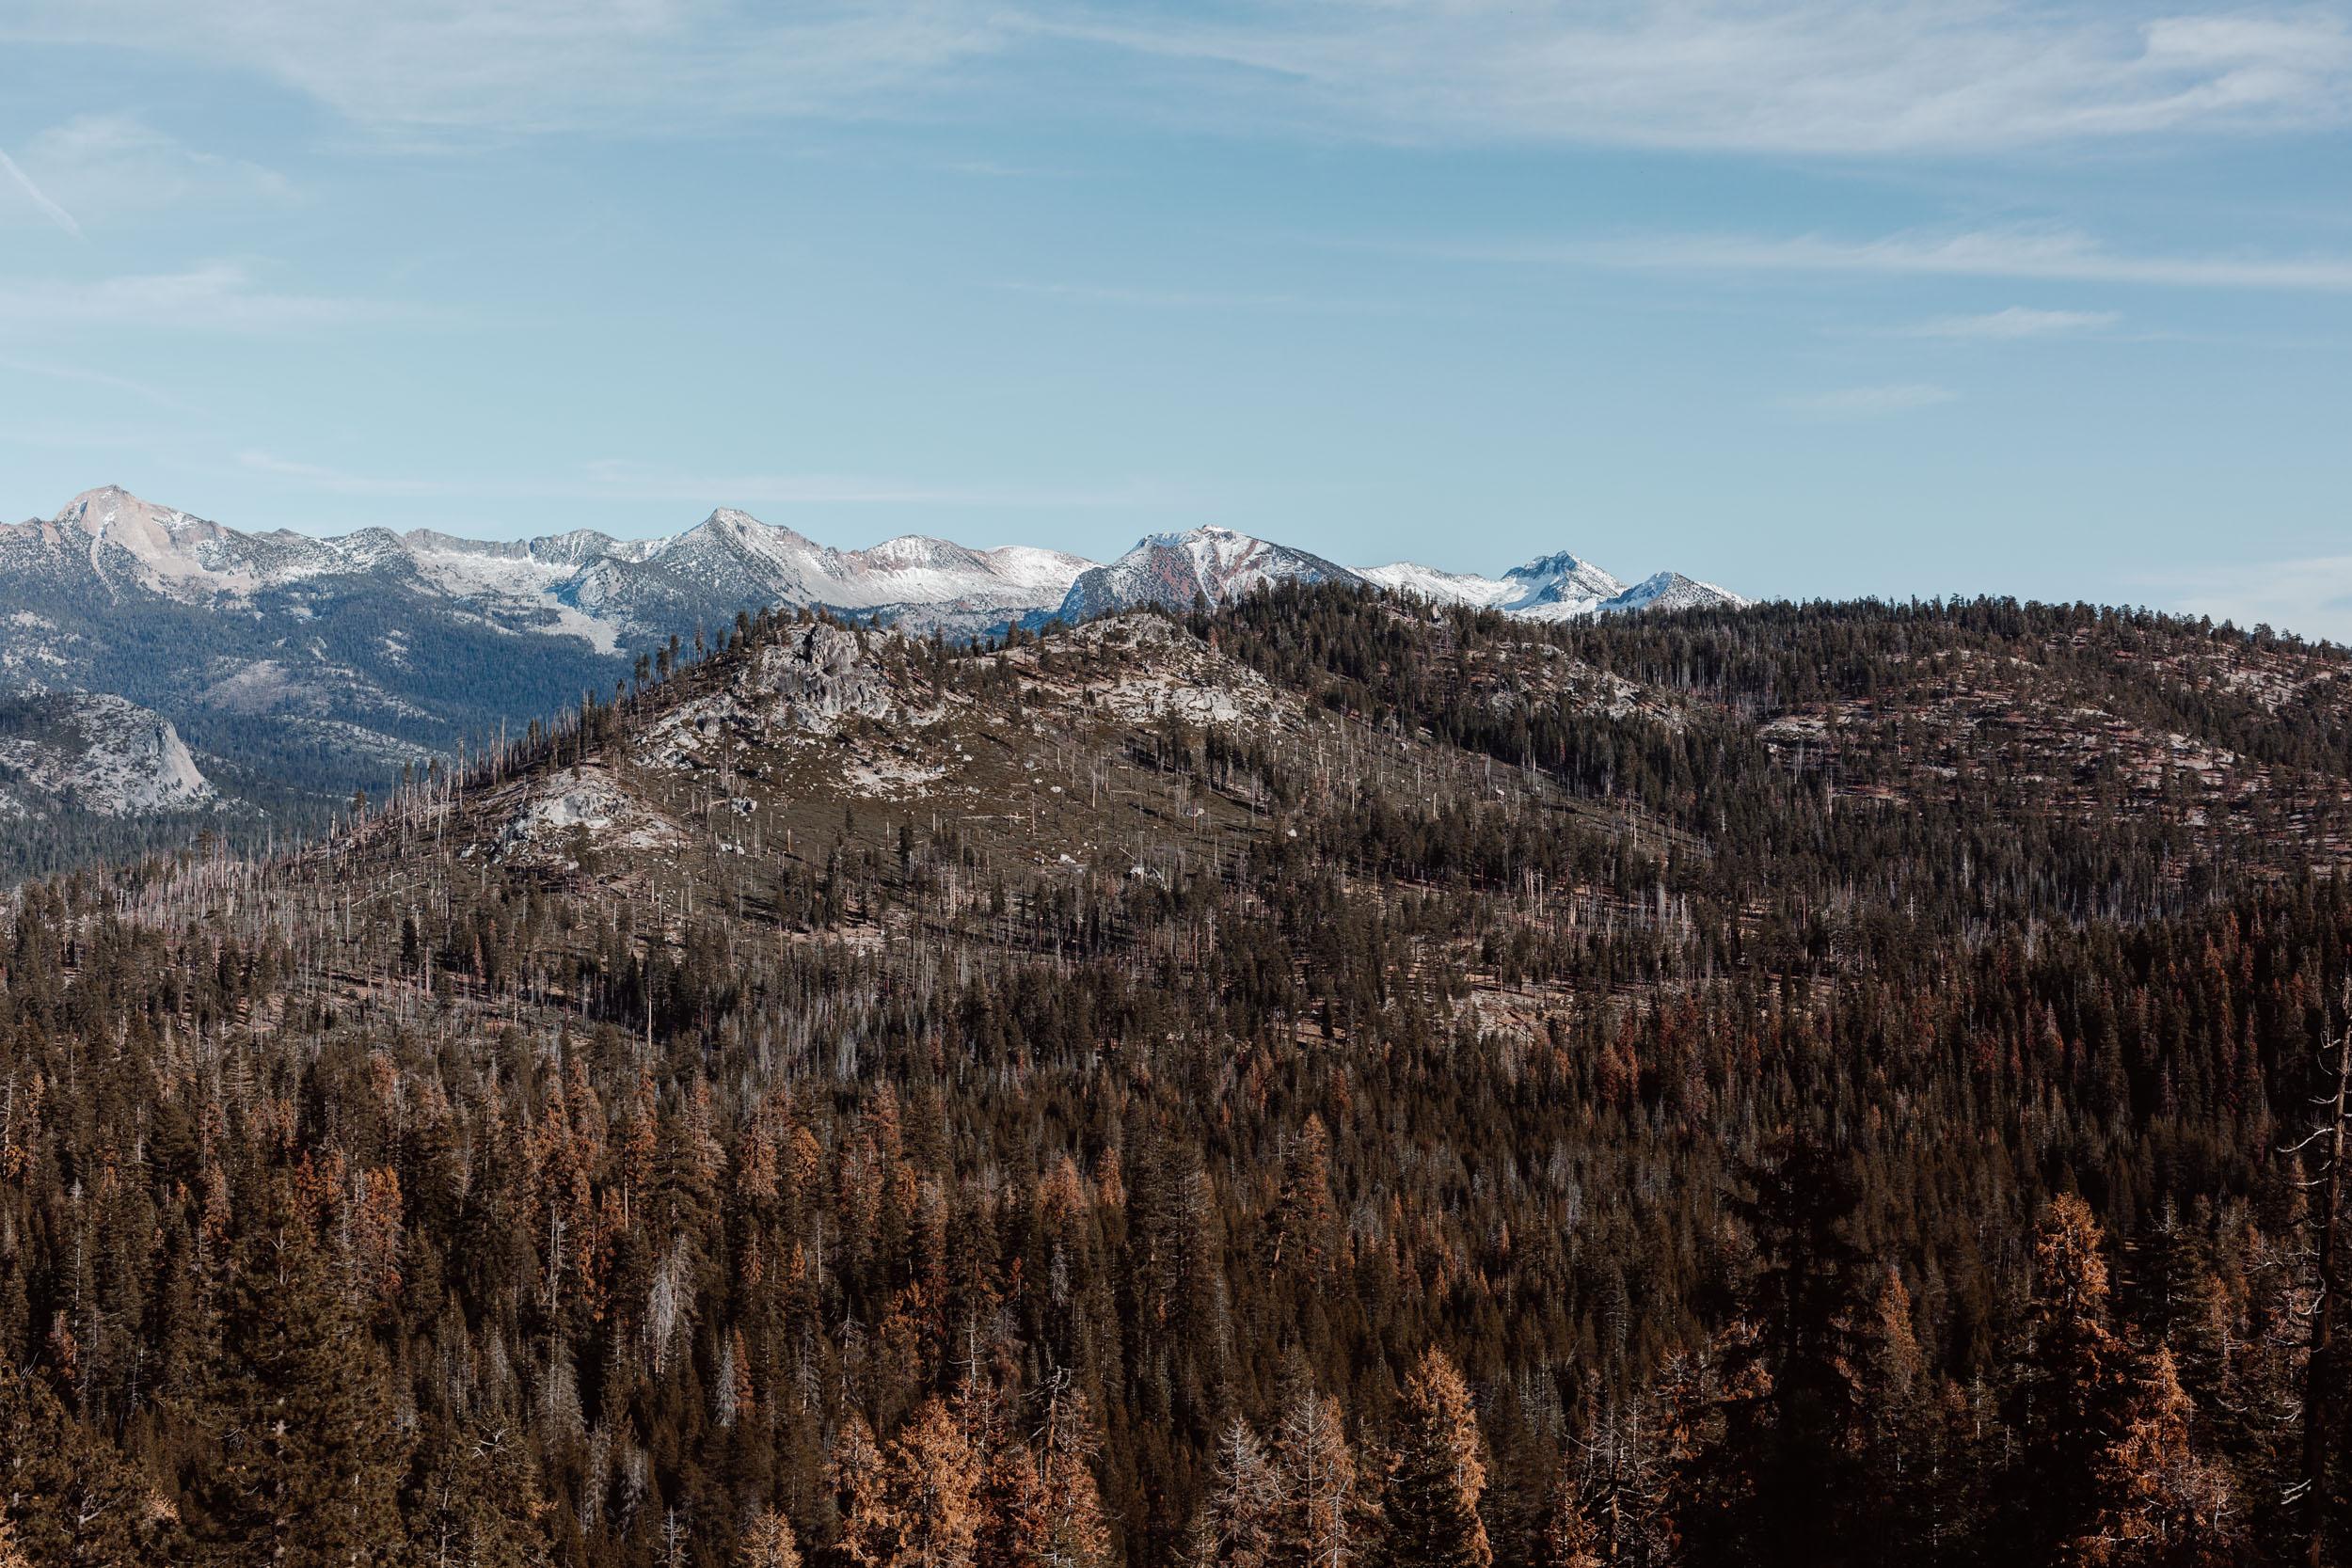 yosemite-glacier-point-road-hike-and-shoot-1.jpg